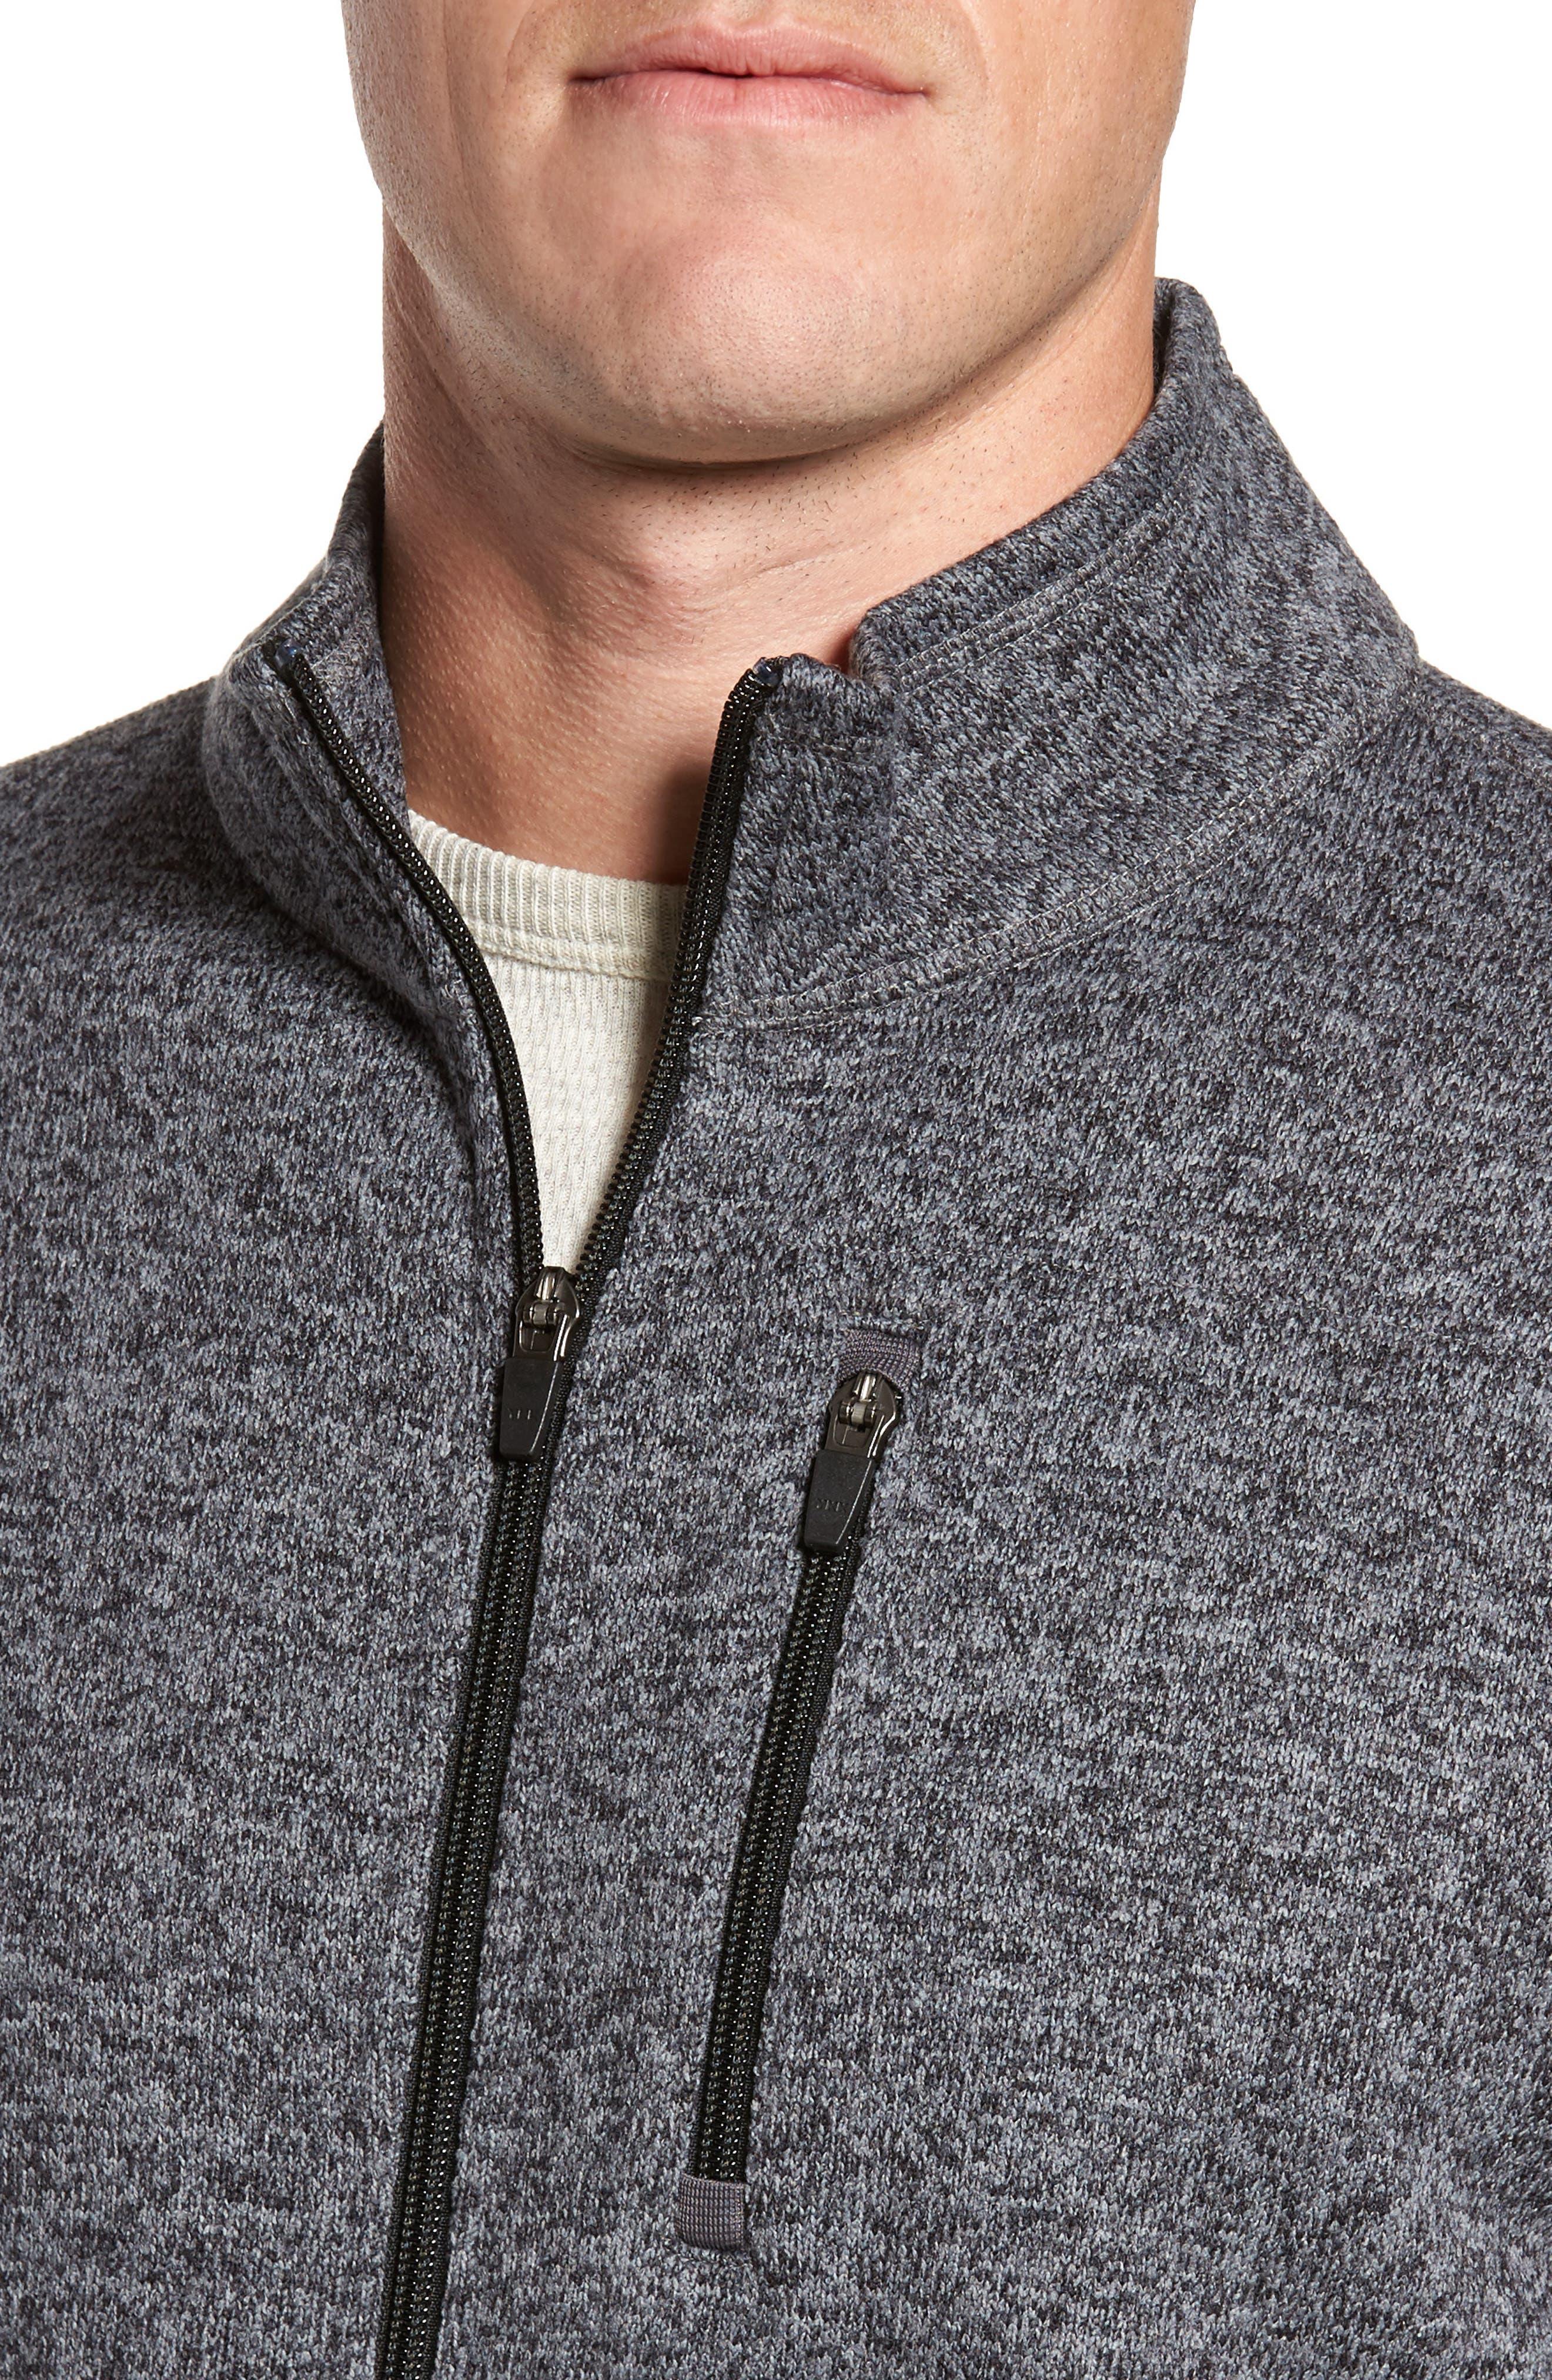 Sweater Knit Fleece Zip Front Jacket,                             Alternate thumbnail 4, color,                             Black/ Grey